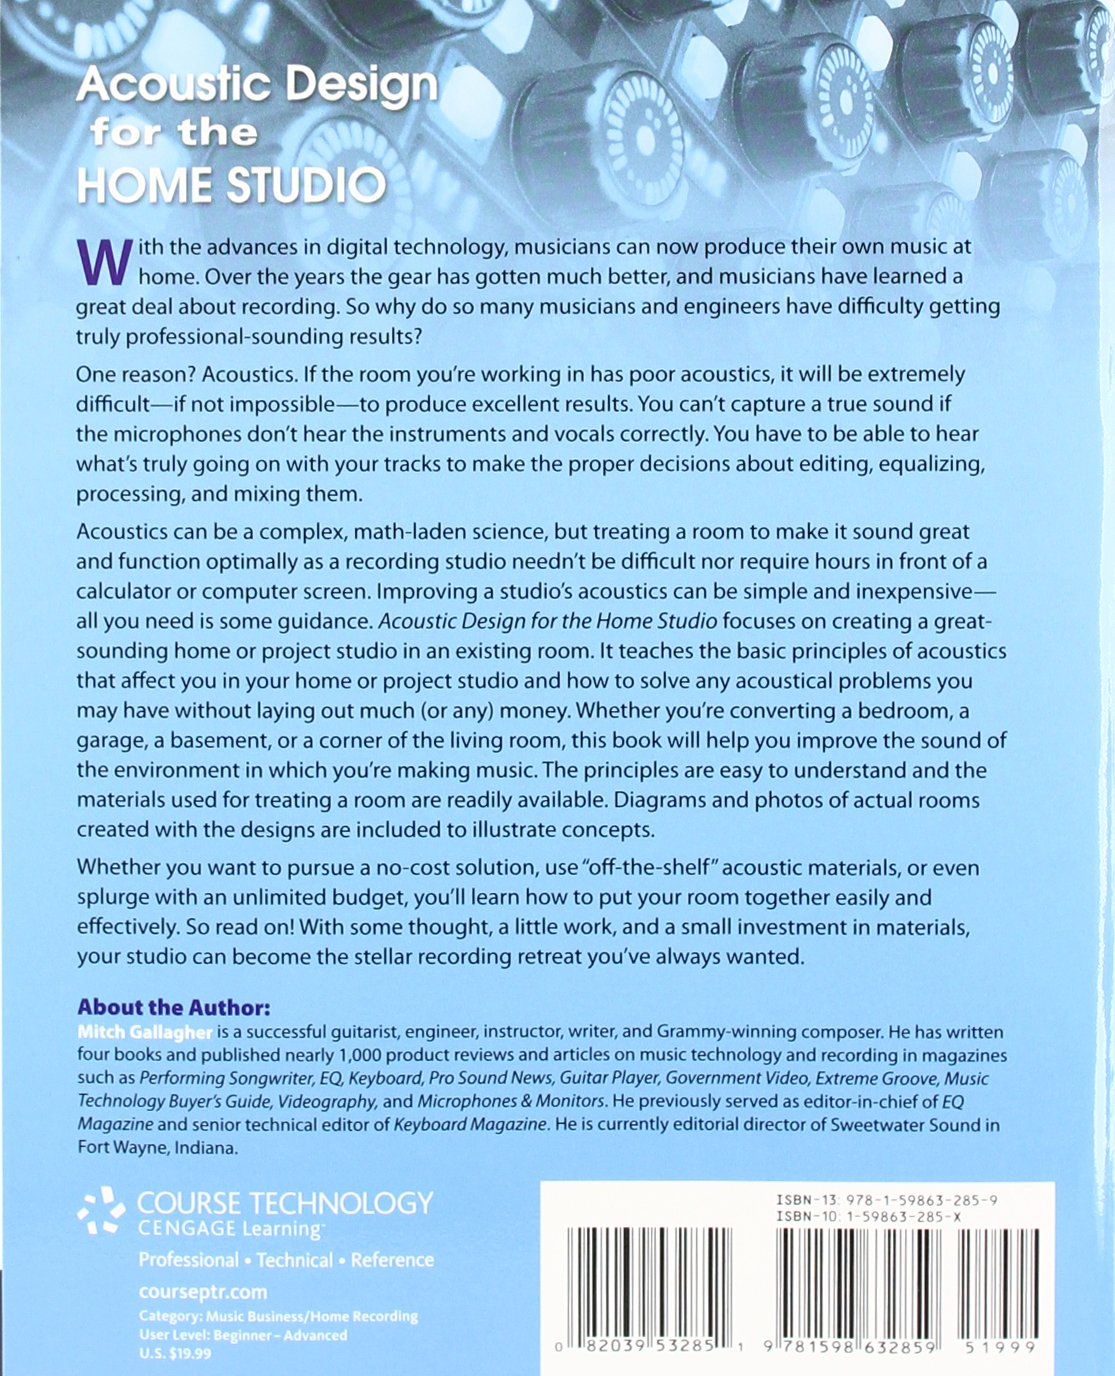 Acoustic Design For The Home Studio: Inc. Course Technology: Amazon.com.mx:  Libros